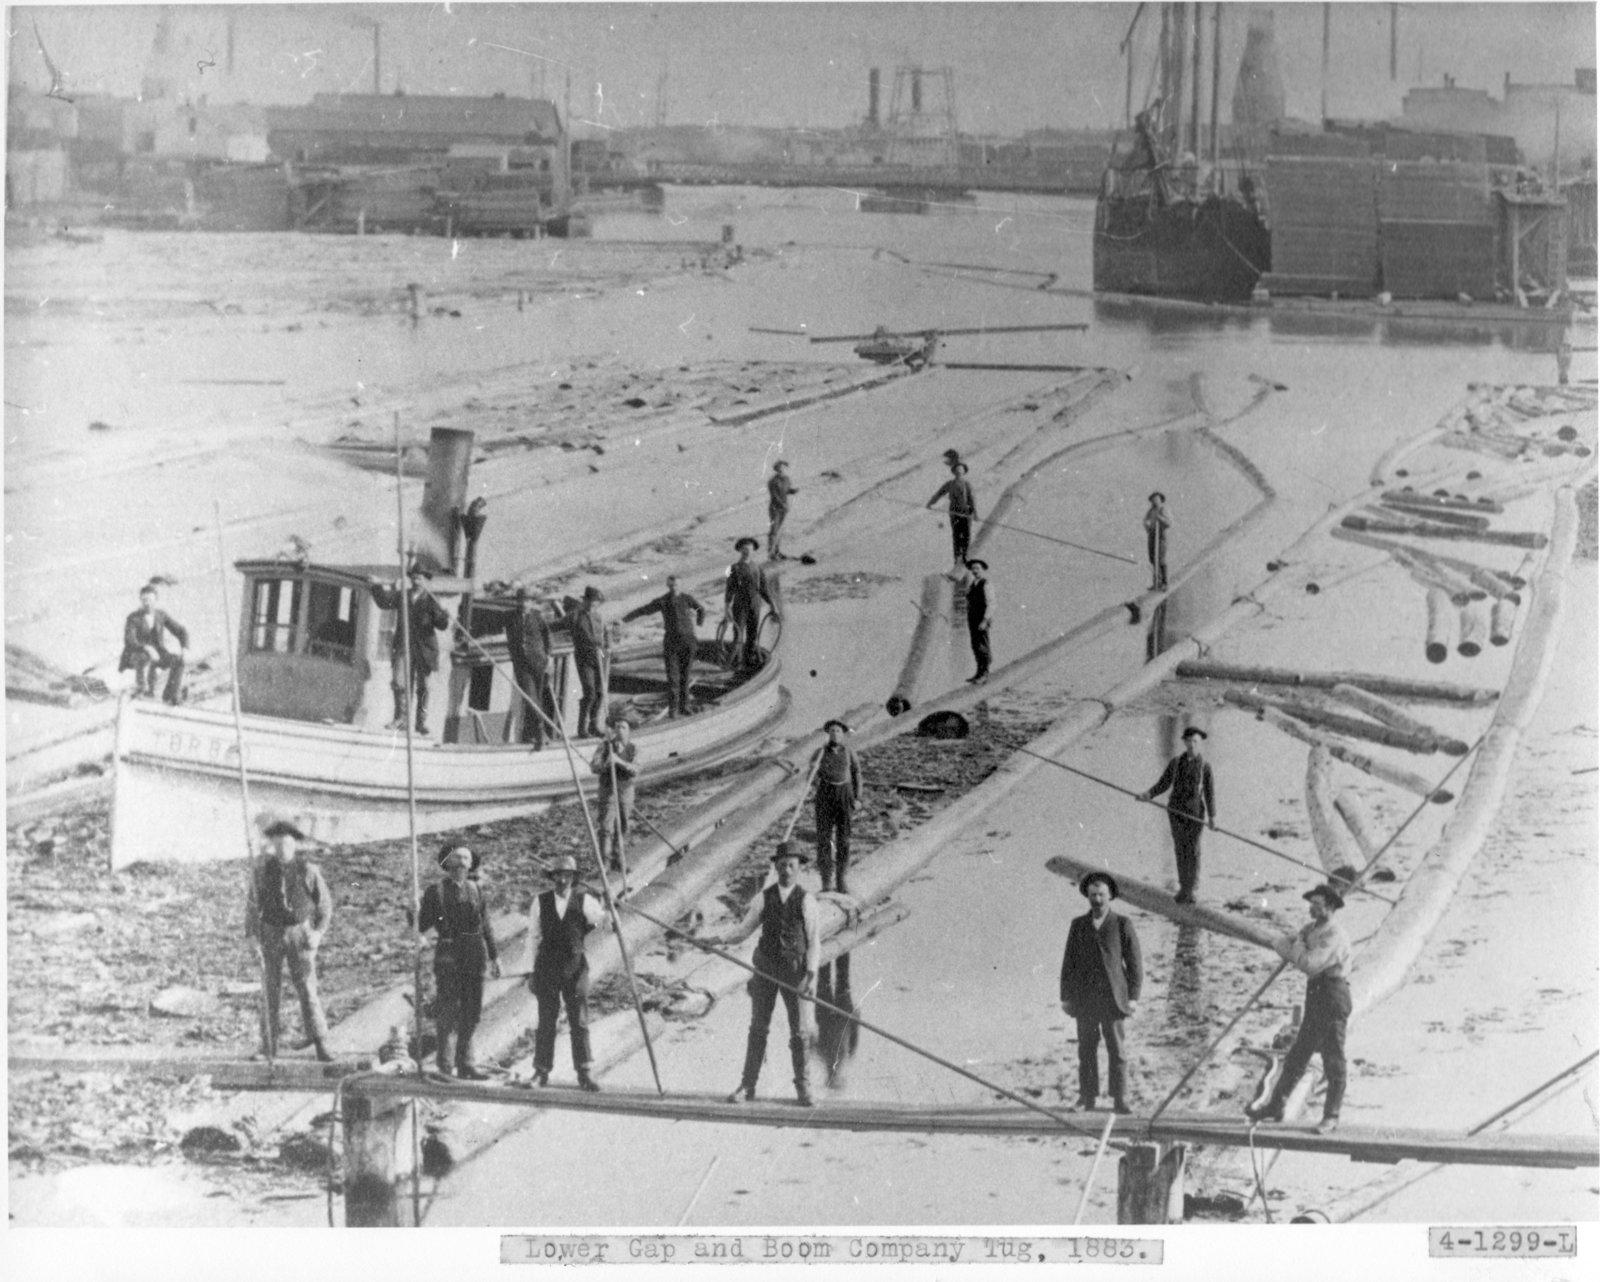 Lower Gap and Boom Company Tug, Thunder Bay River